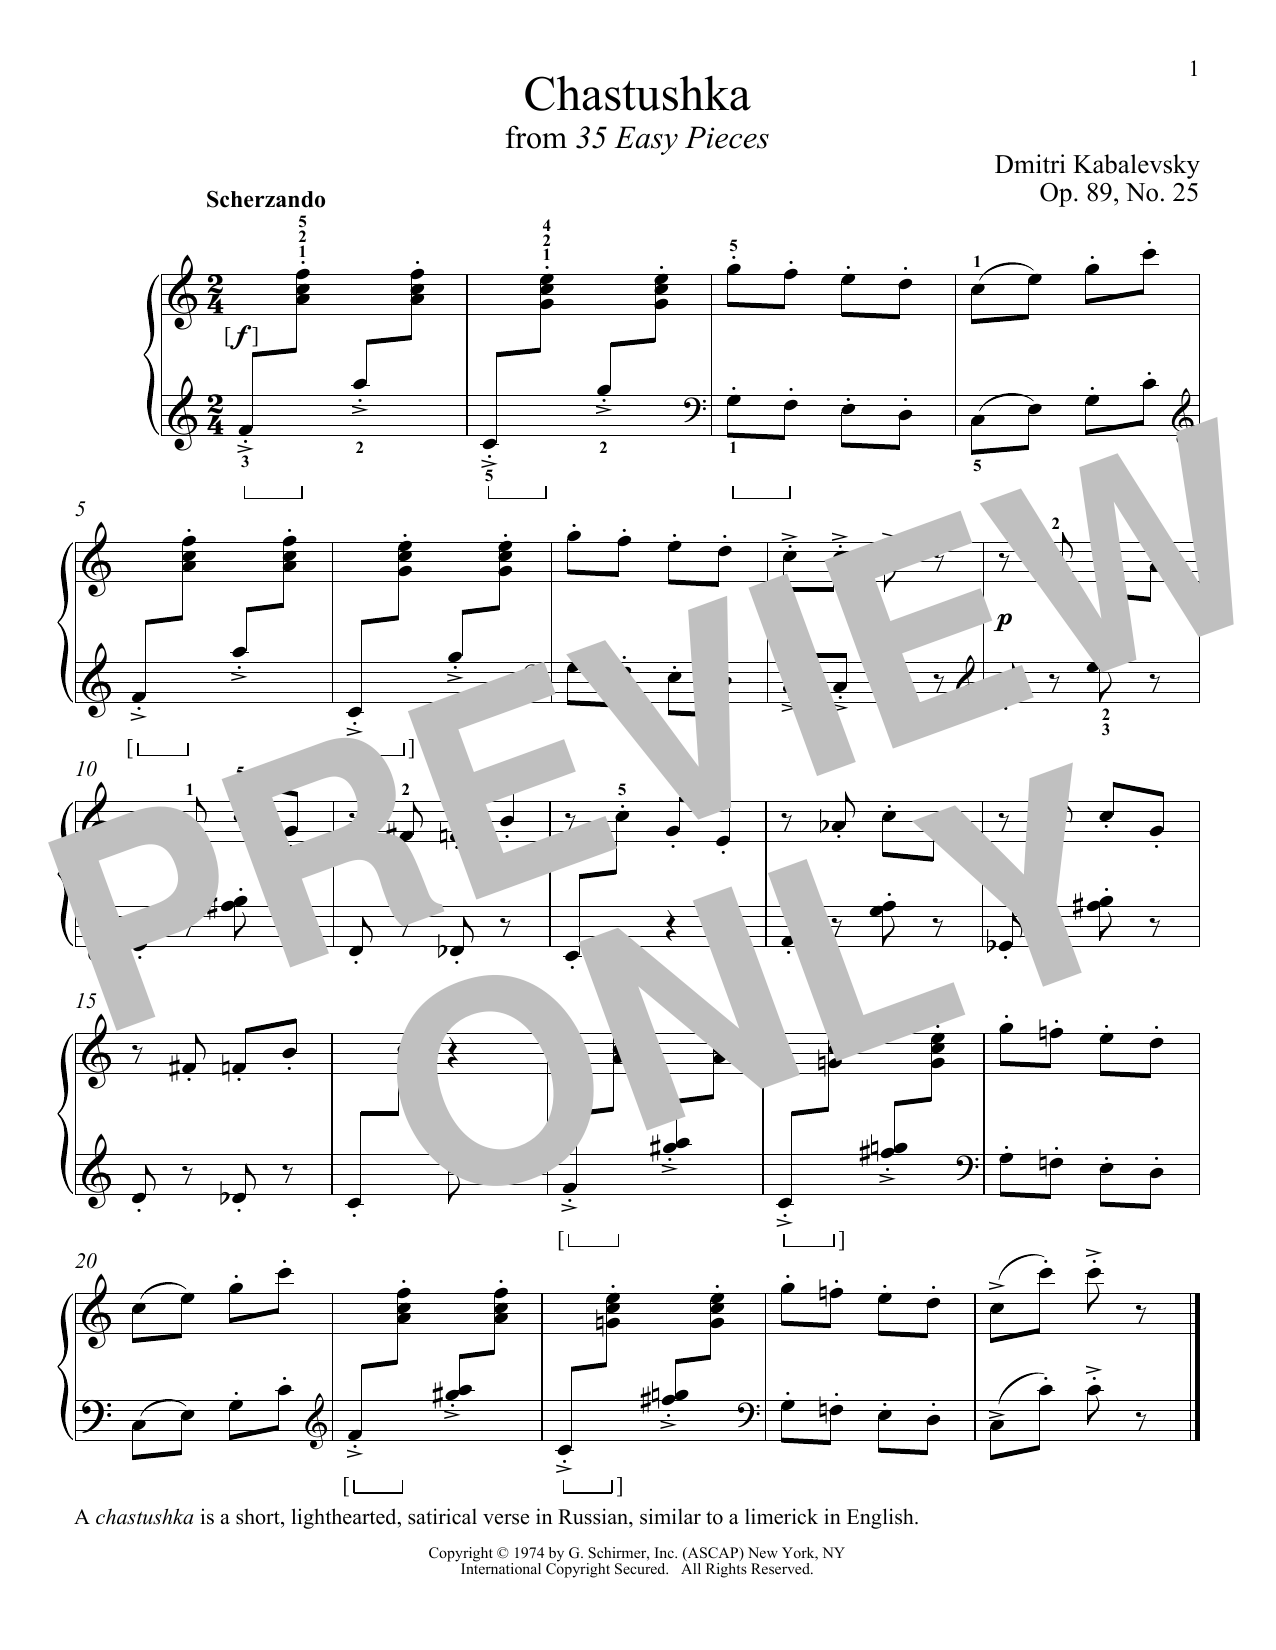 Chastushka, Op. 89, No. 25 Sheet Music